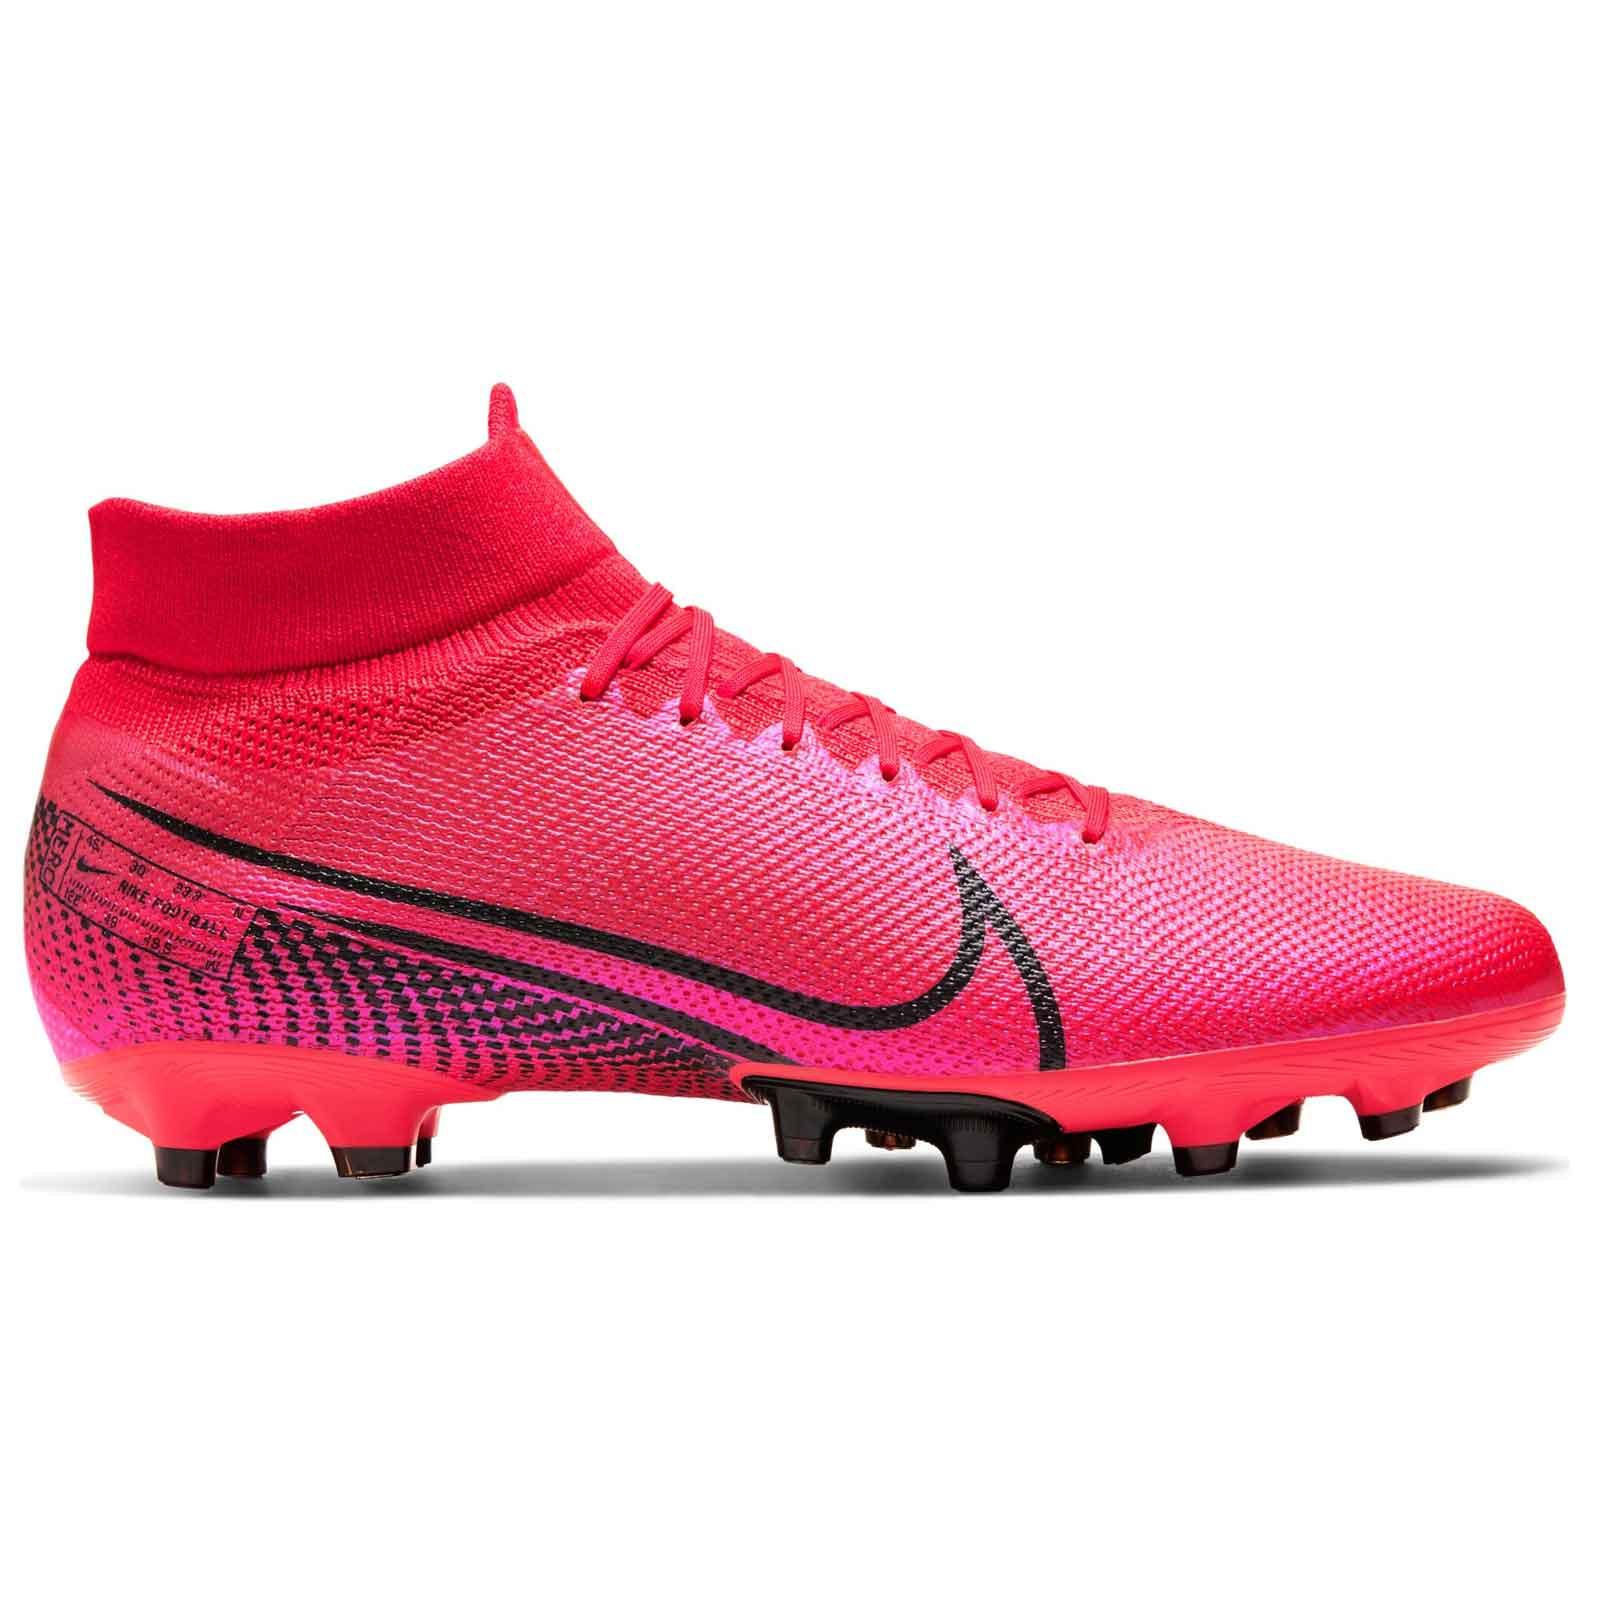 parrilla Espíritu Galleta  Nike Mercurial Superfly 7 Pro AG-PRO rosas  futbolmania